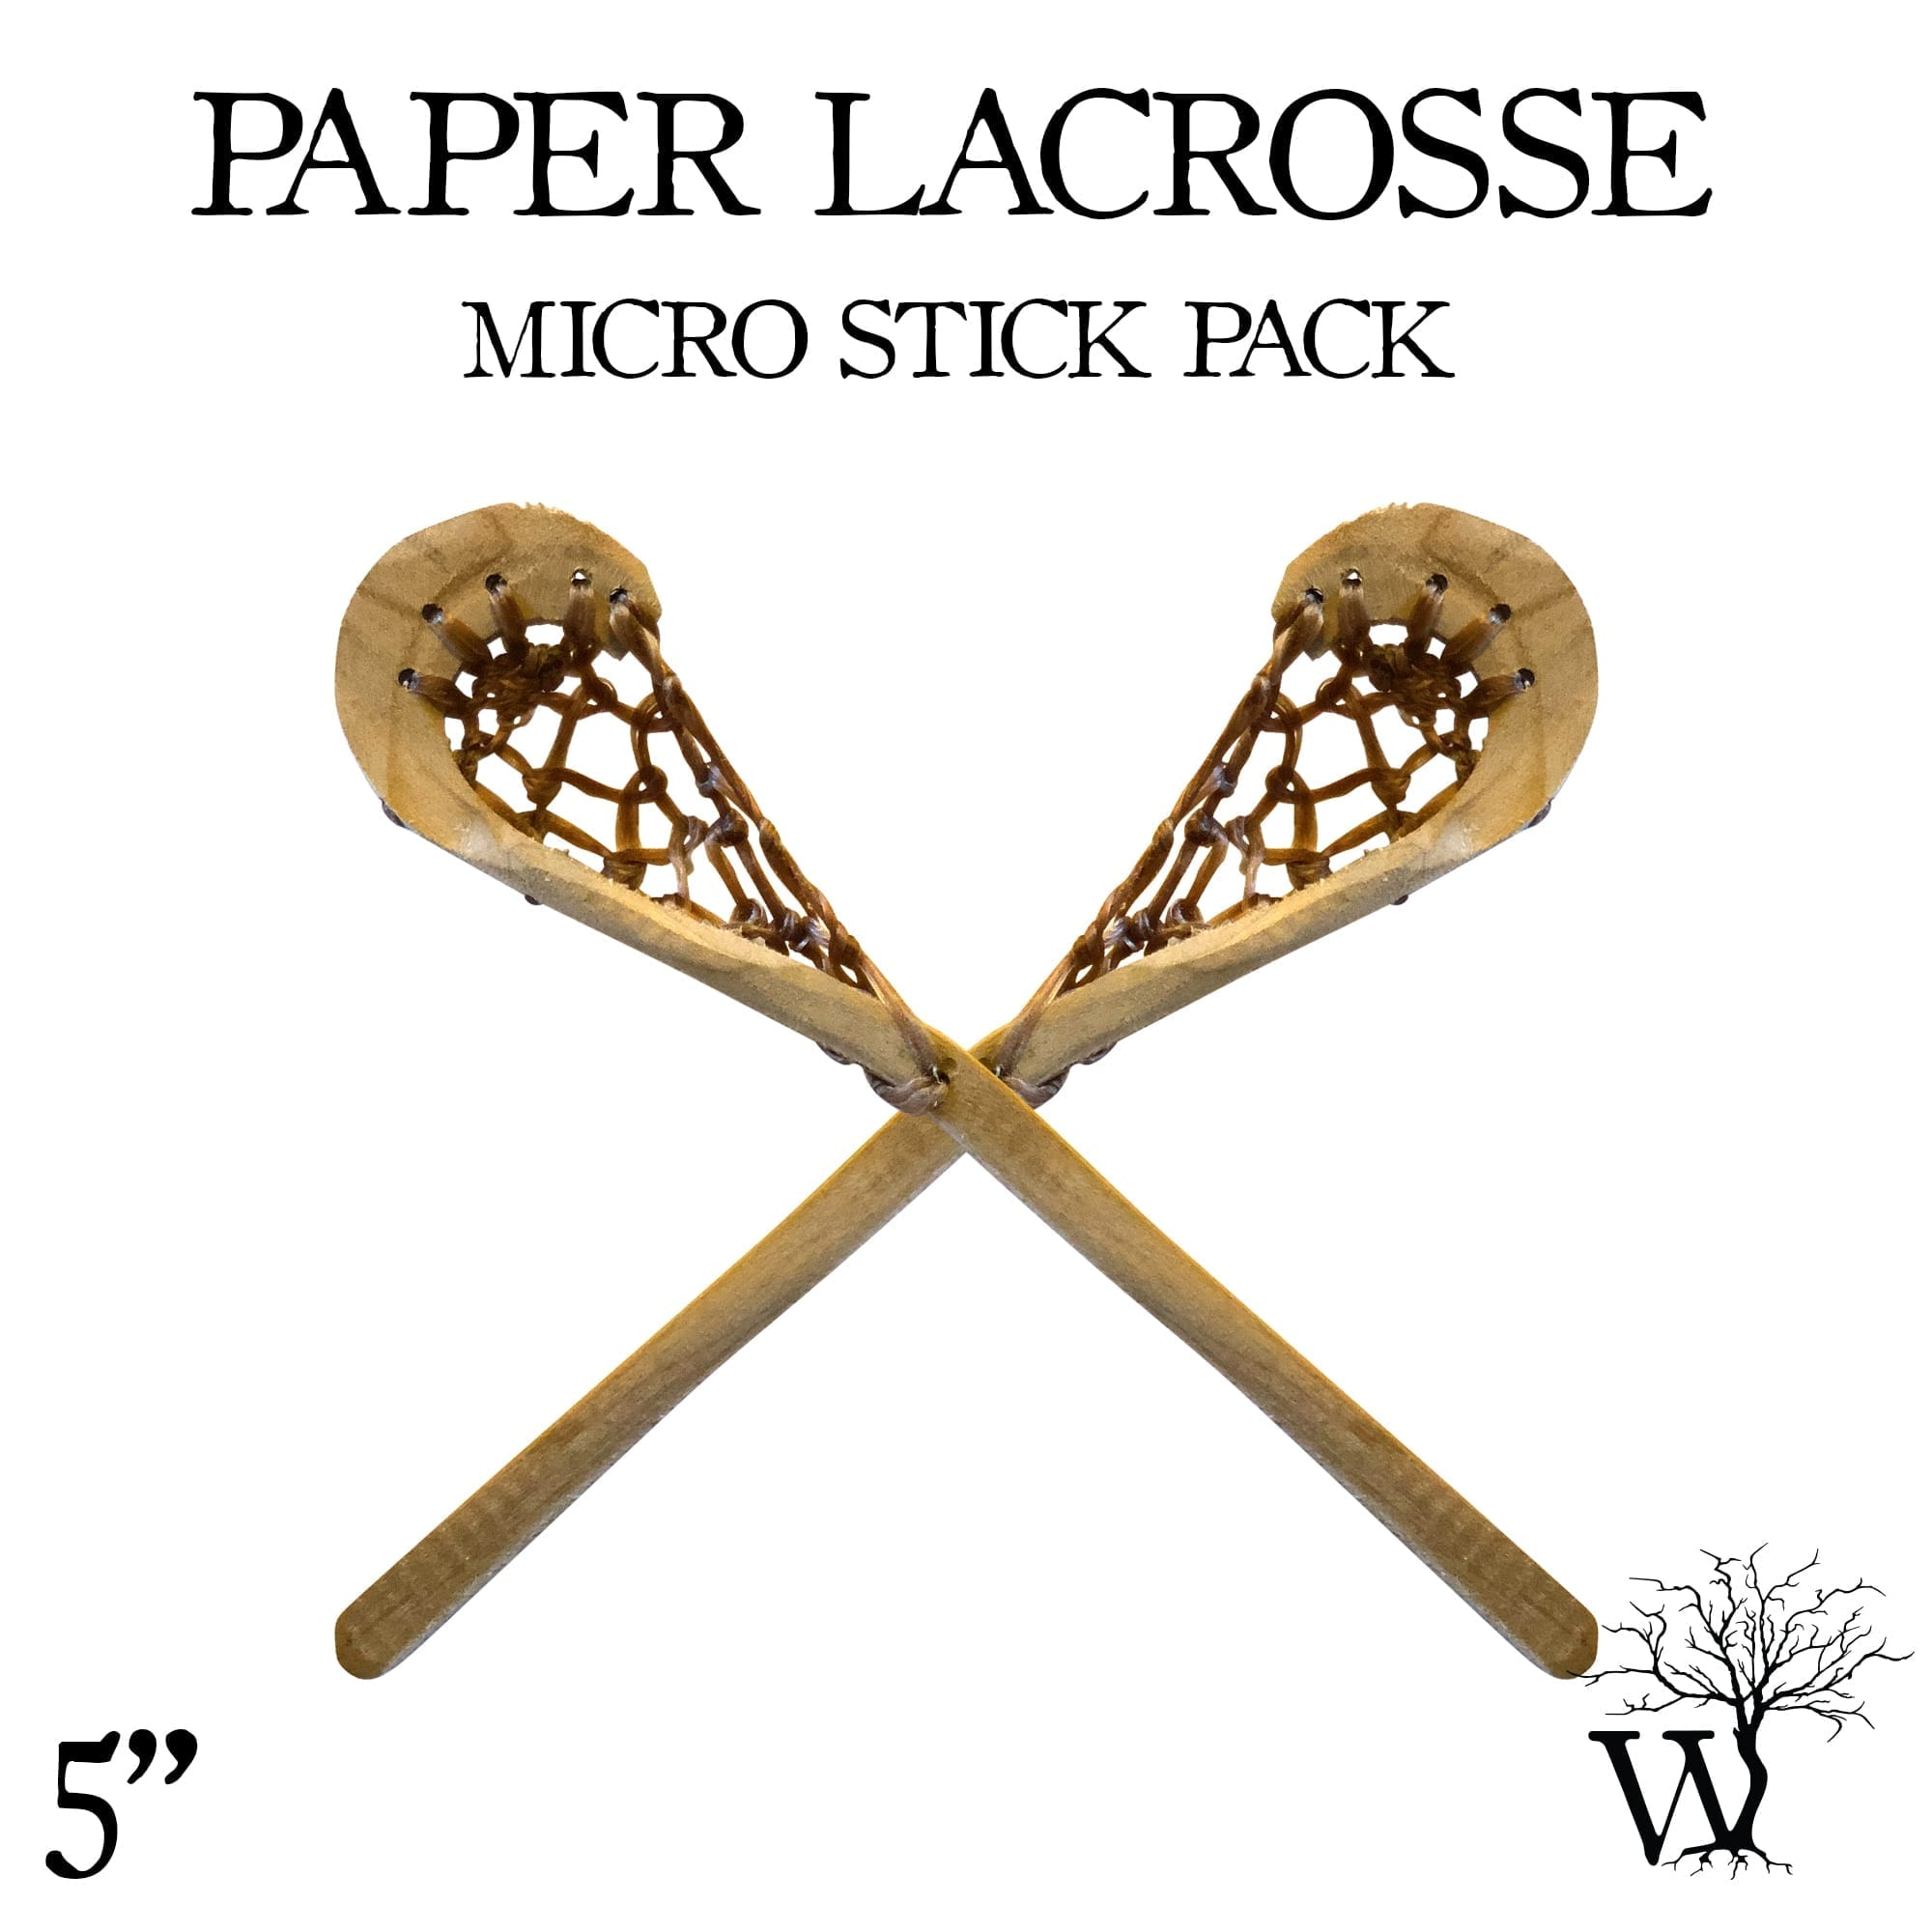 Paper Lacrosse Sticks 2 Pack